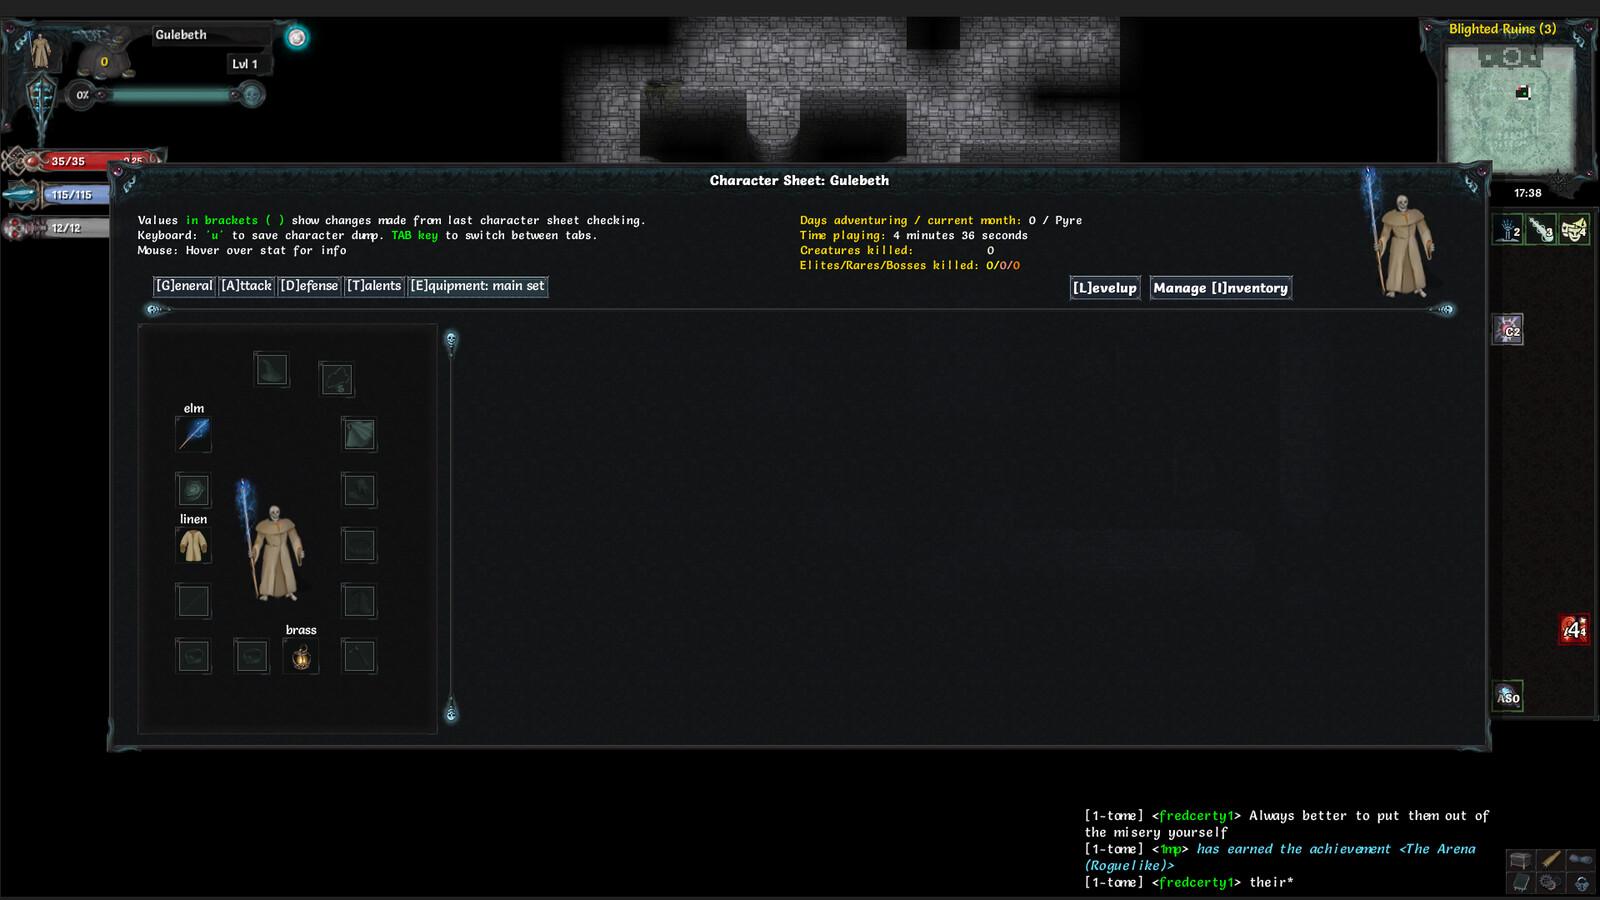 Spectre UI ingame